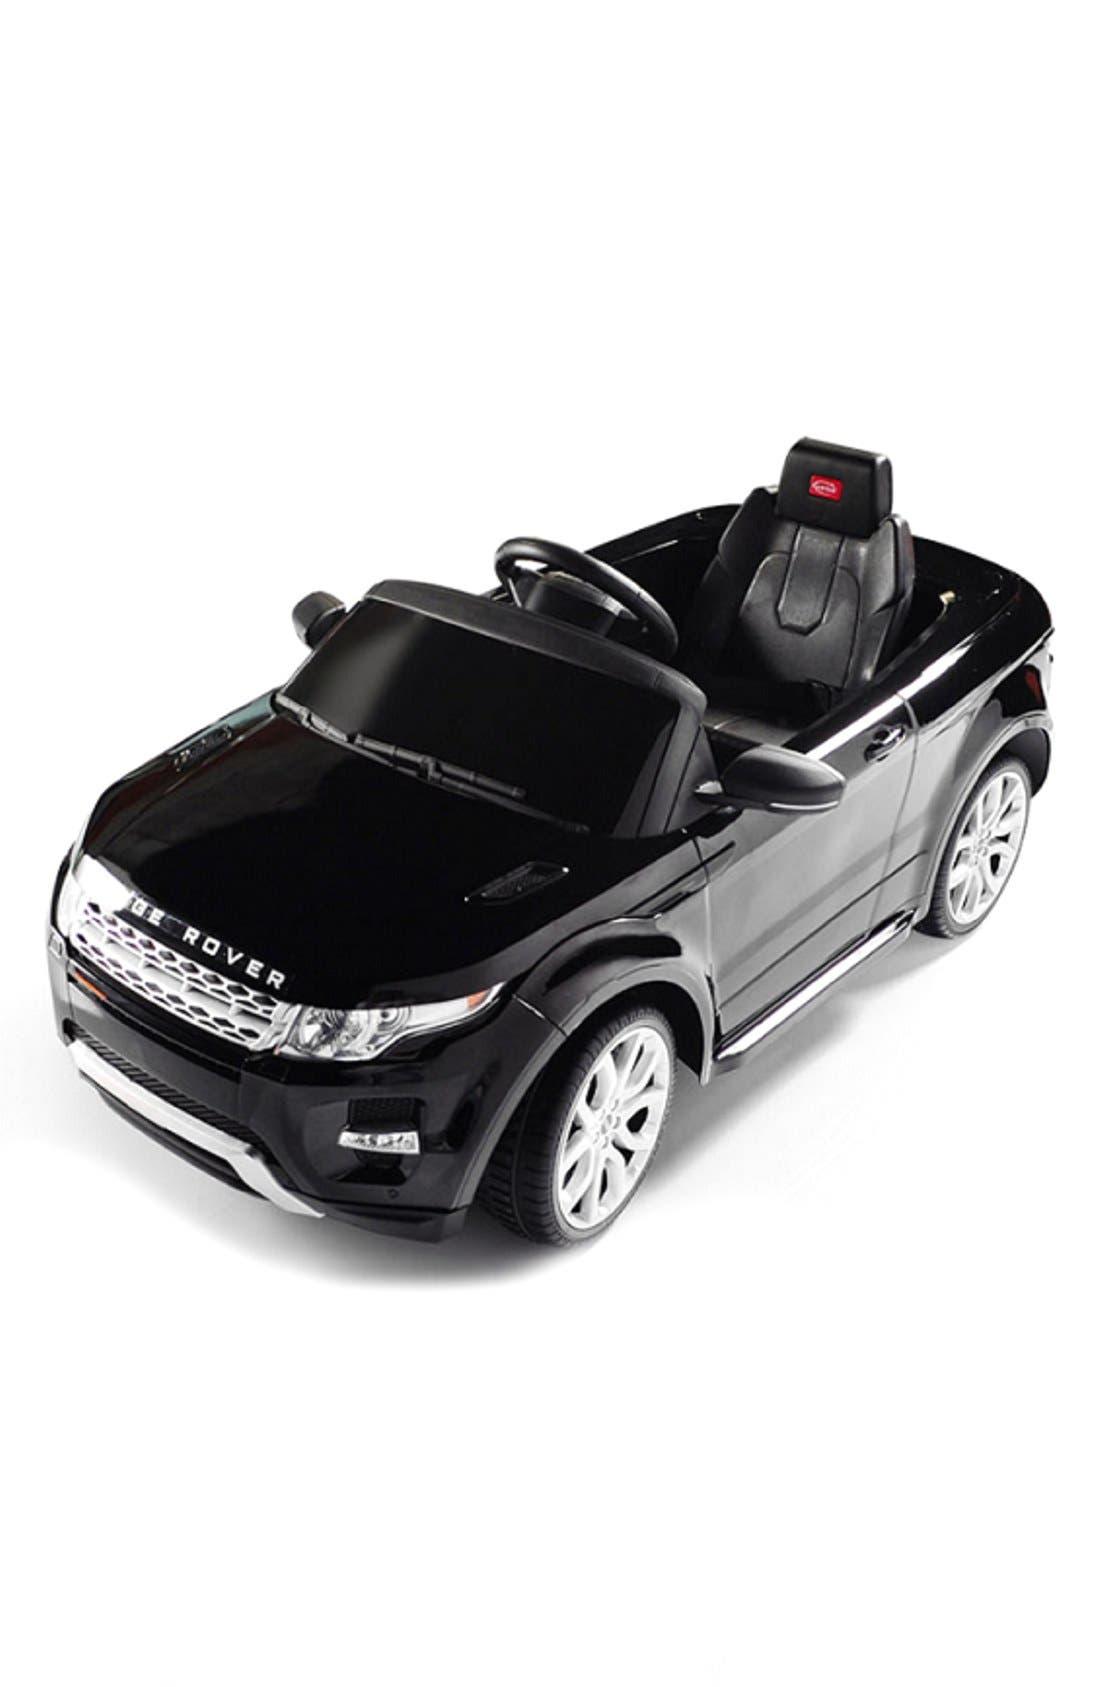 'Range Rover Evoque' 12V RC Ride-On Toy Car,                             Alternate thumbnail 3, color,                             001